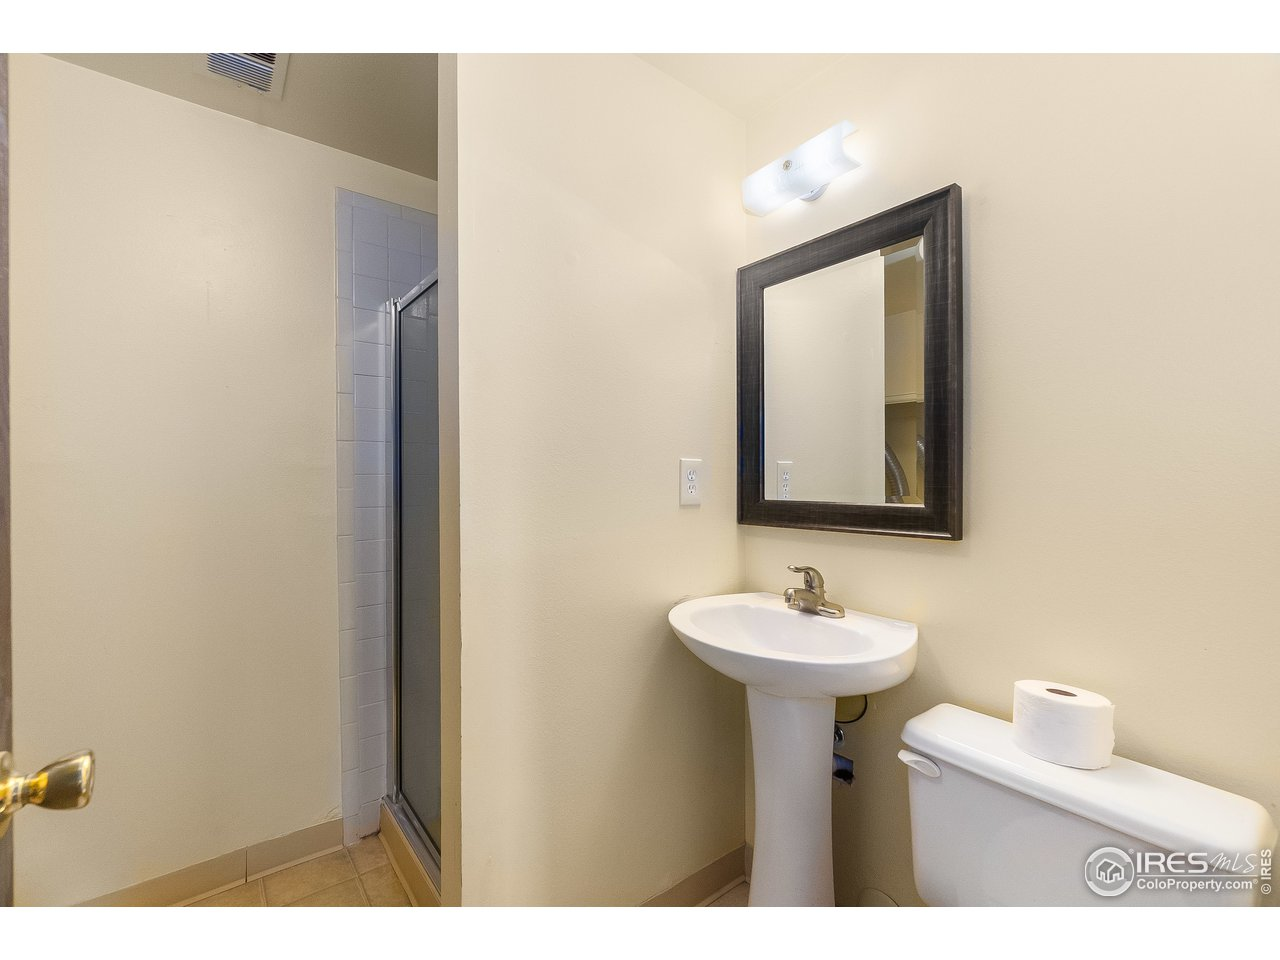 3/4 bath and laundry room